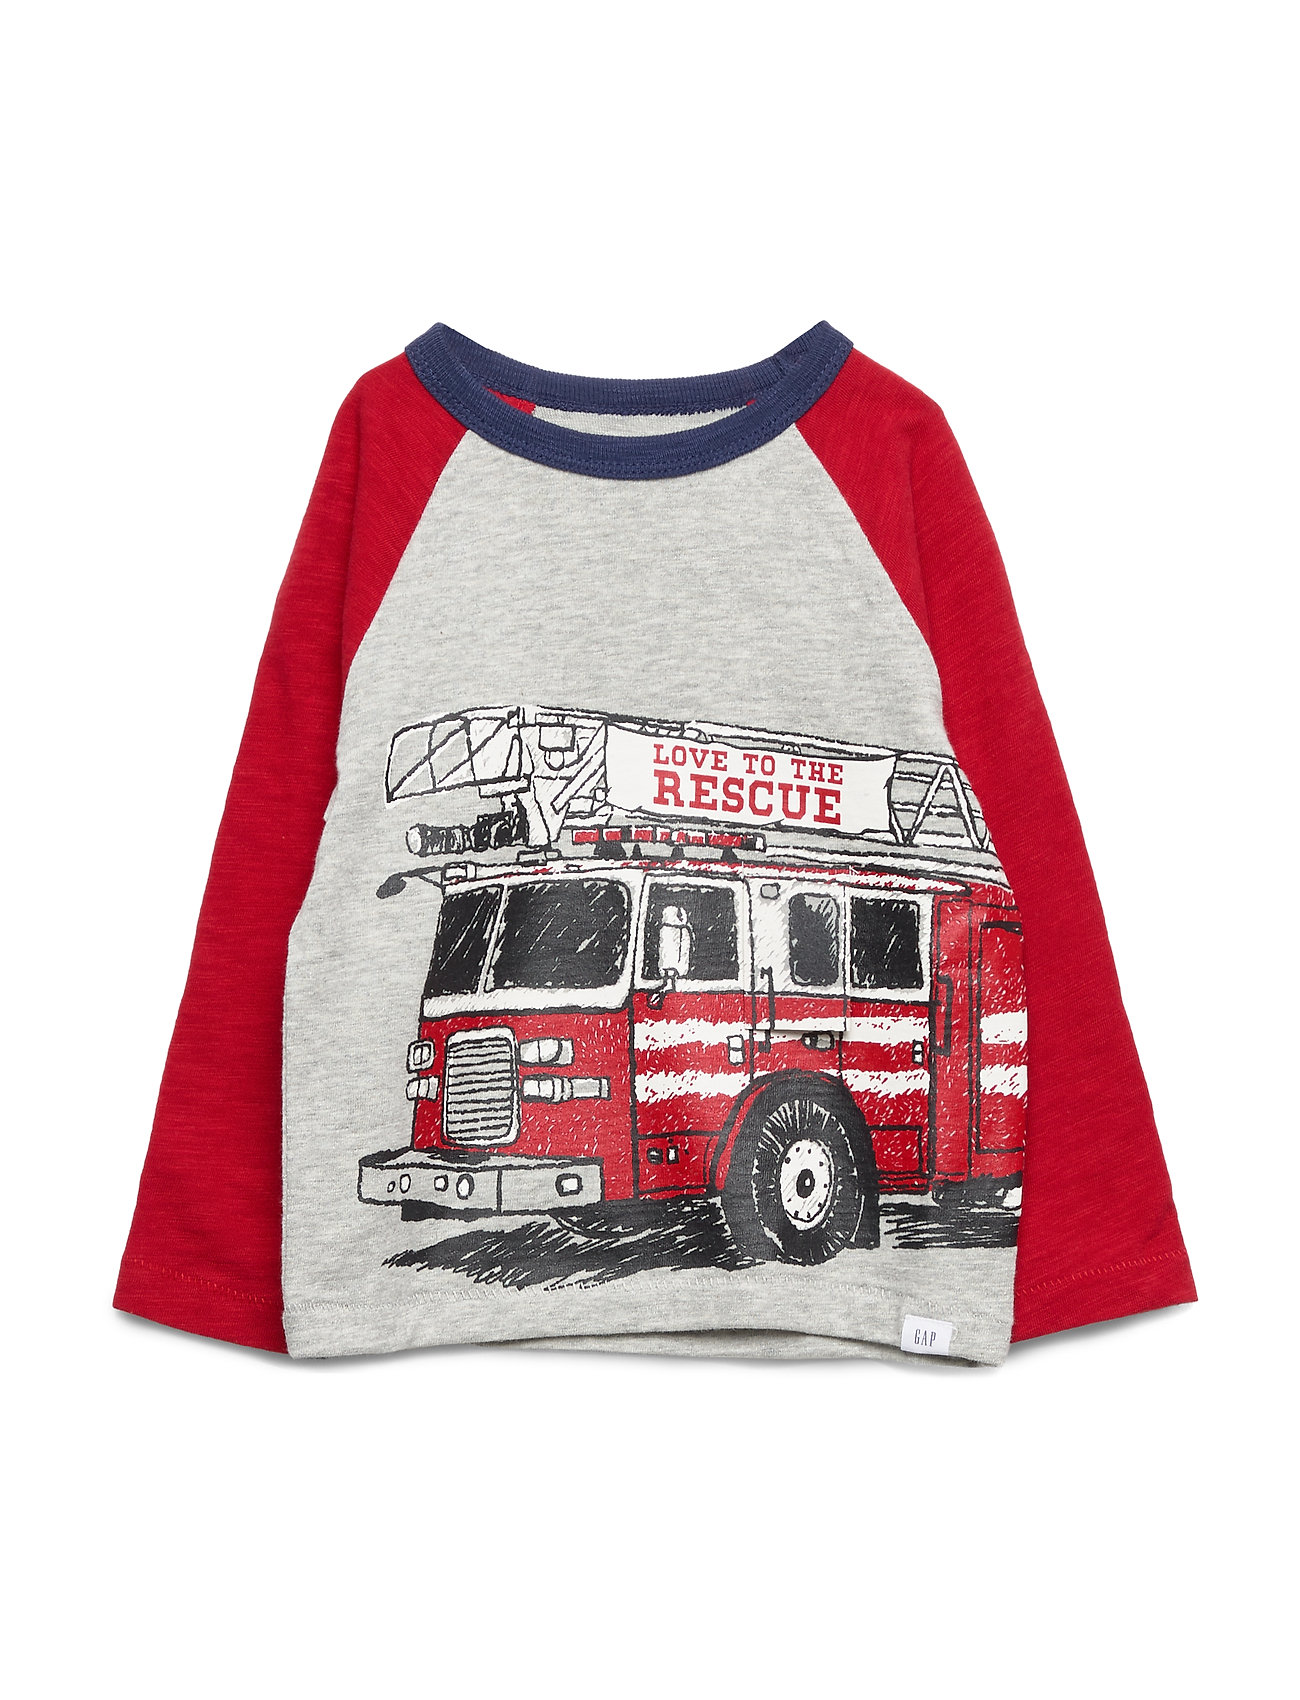 GAP Toddler Graphic T-Shirt - LIGHT HEATHER GREY V6